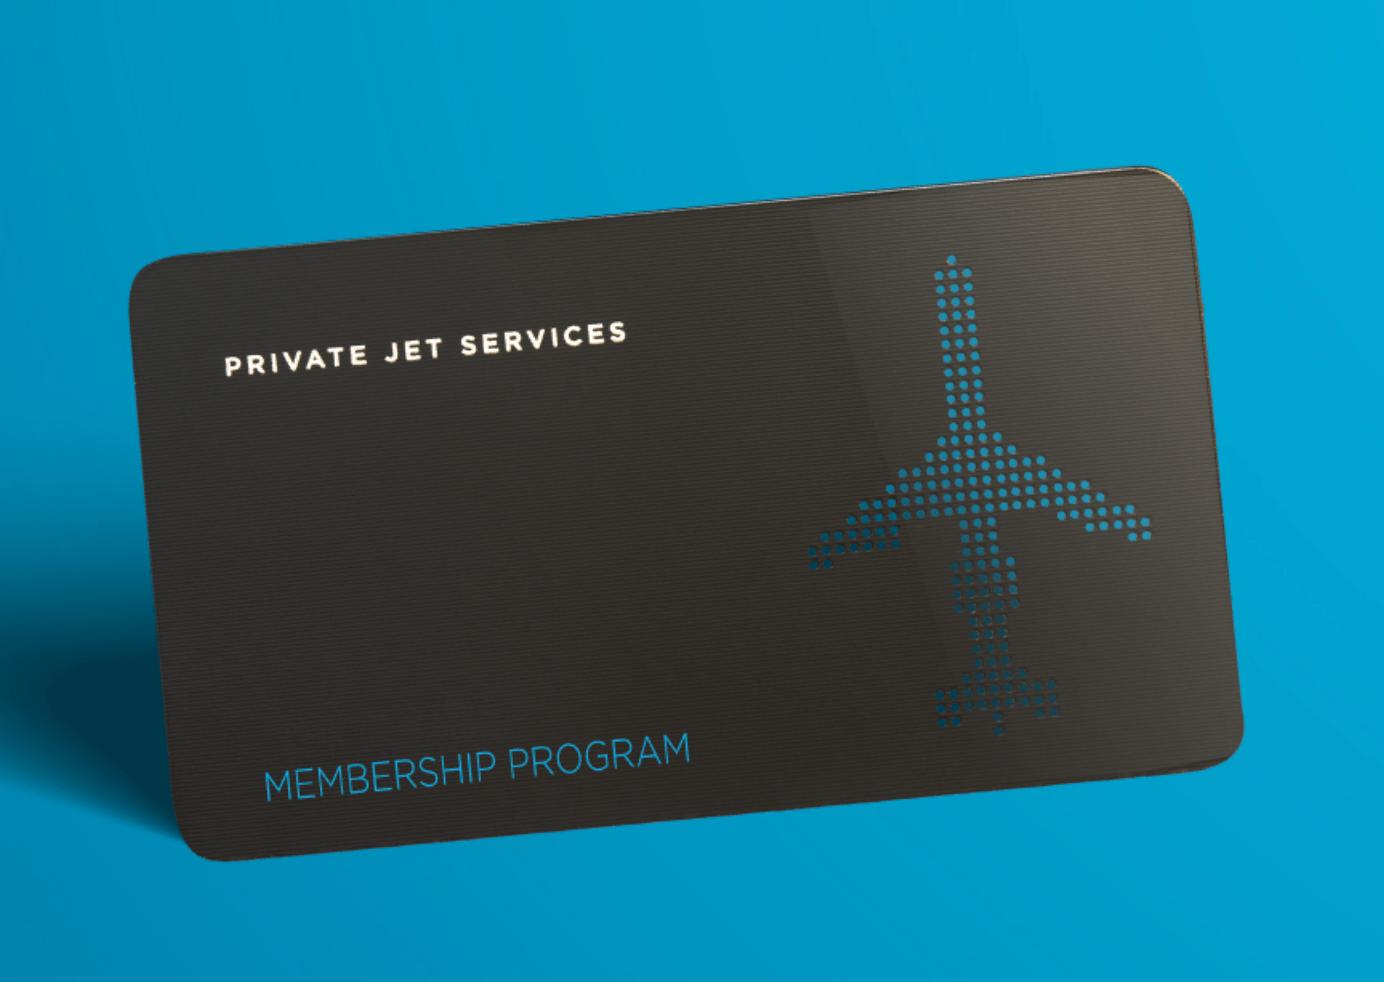 Private Jet Services PJS jet card